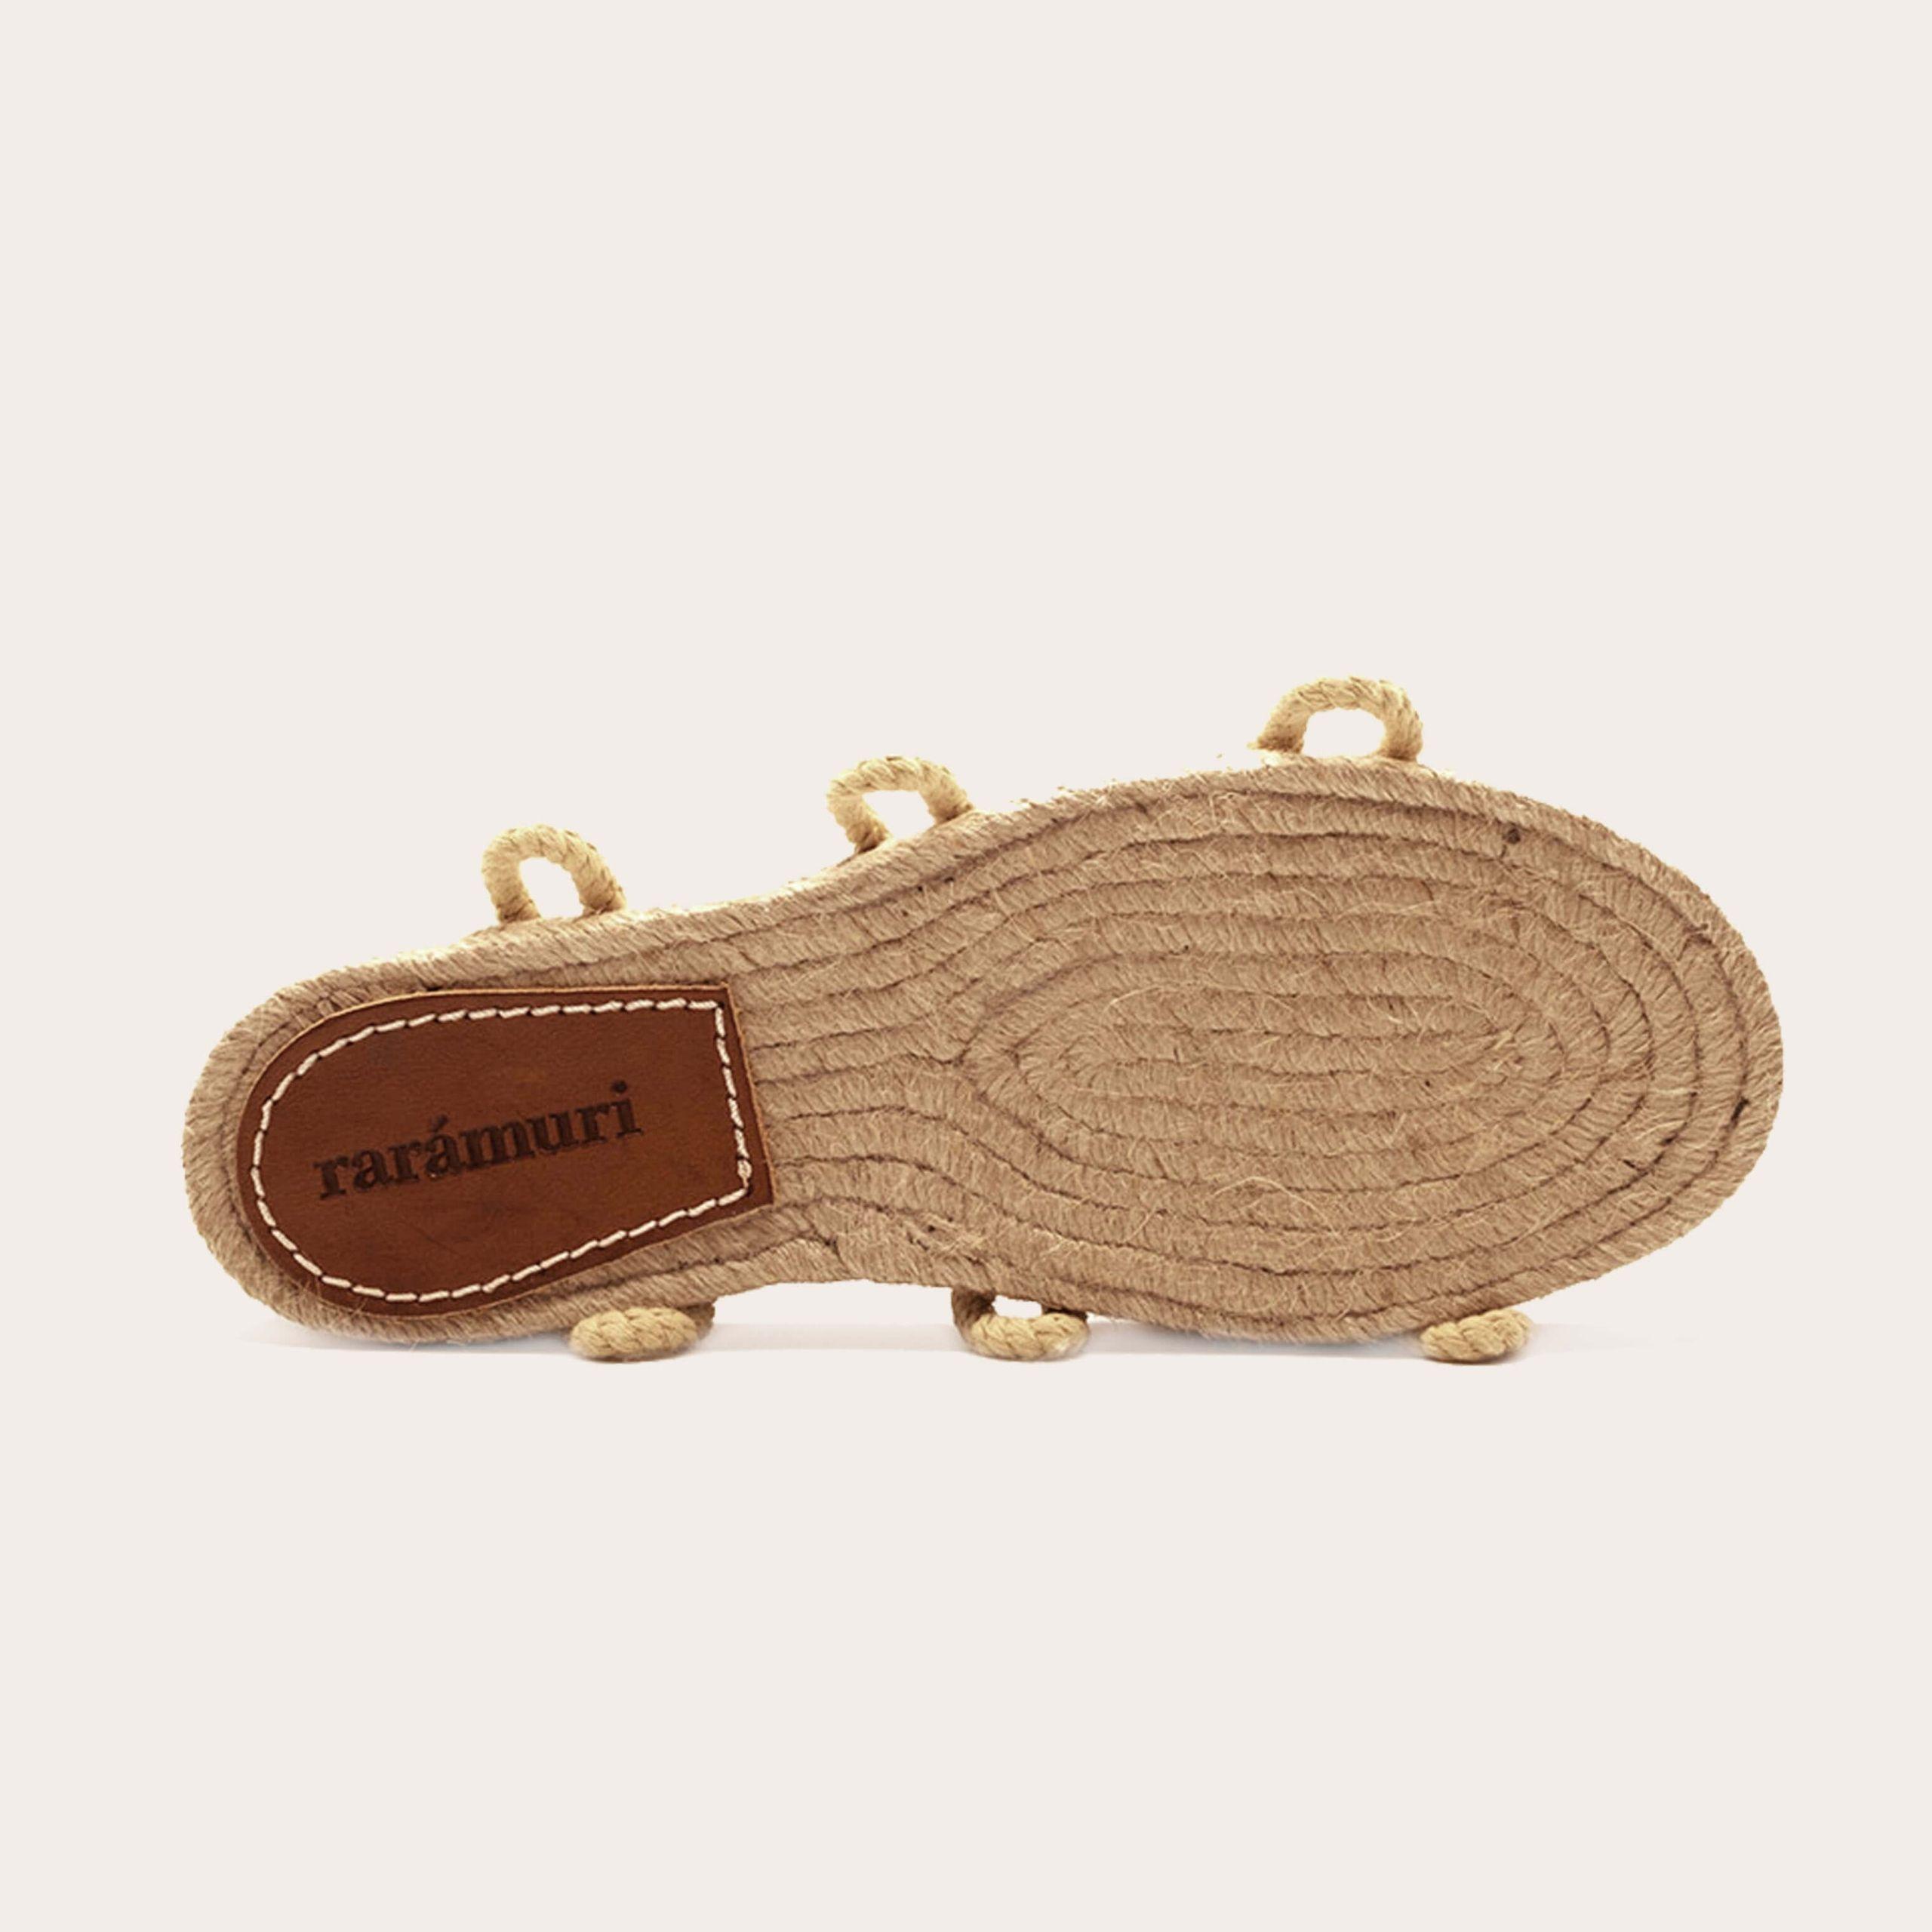 cruz-high_3_lintsandalen sandals travelsandals vegan sustainable sandals wikkelsandalen